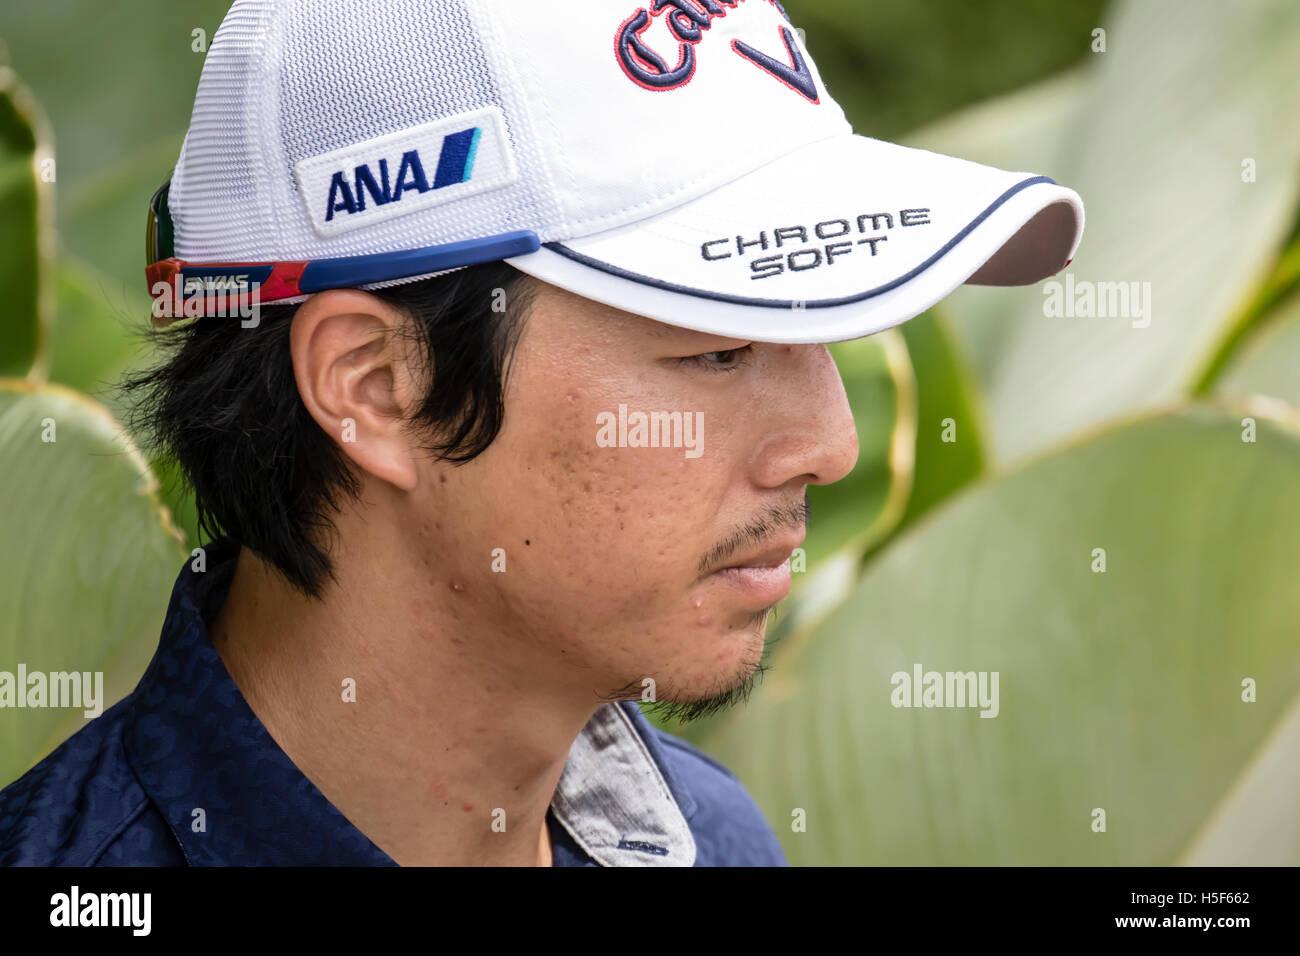 Kuala Lumpur, Malaysia. 20th Oct, 2016. Ryo Ishikawa at the CIMB PGA 2016 Golf Championship at TPCKL golf course - Stock Image